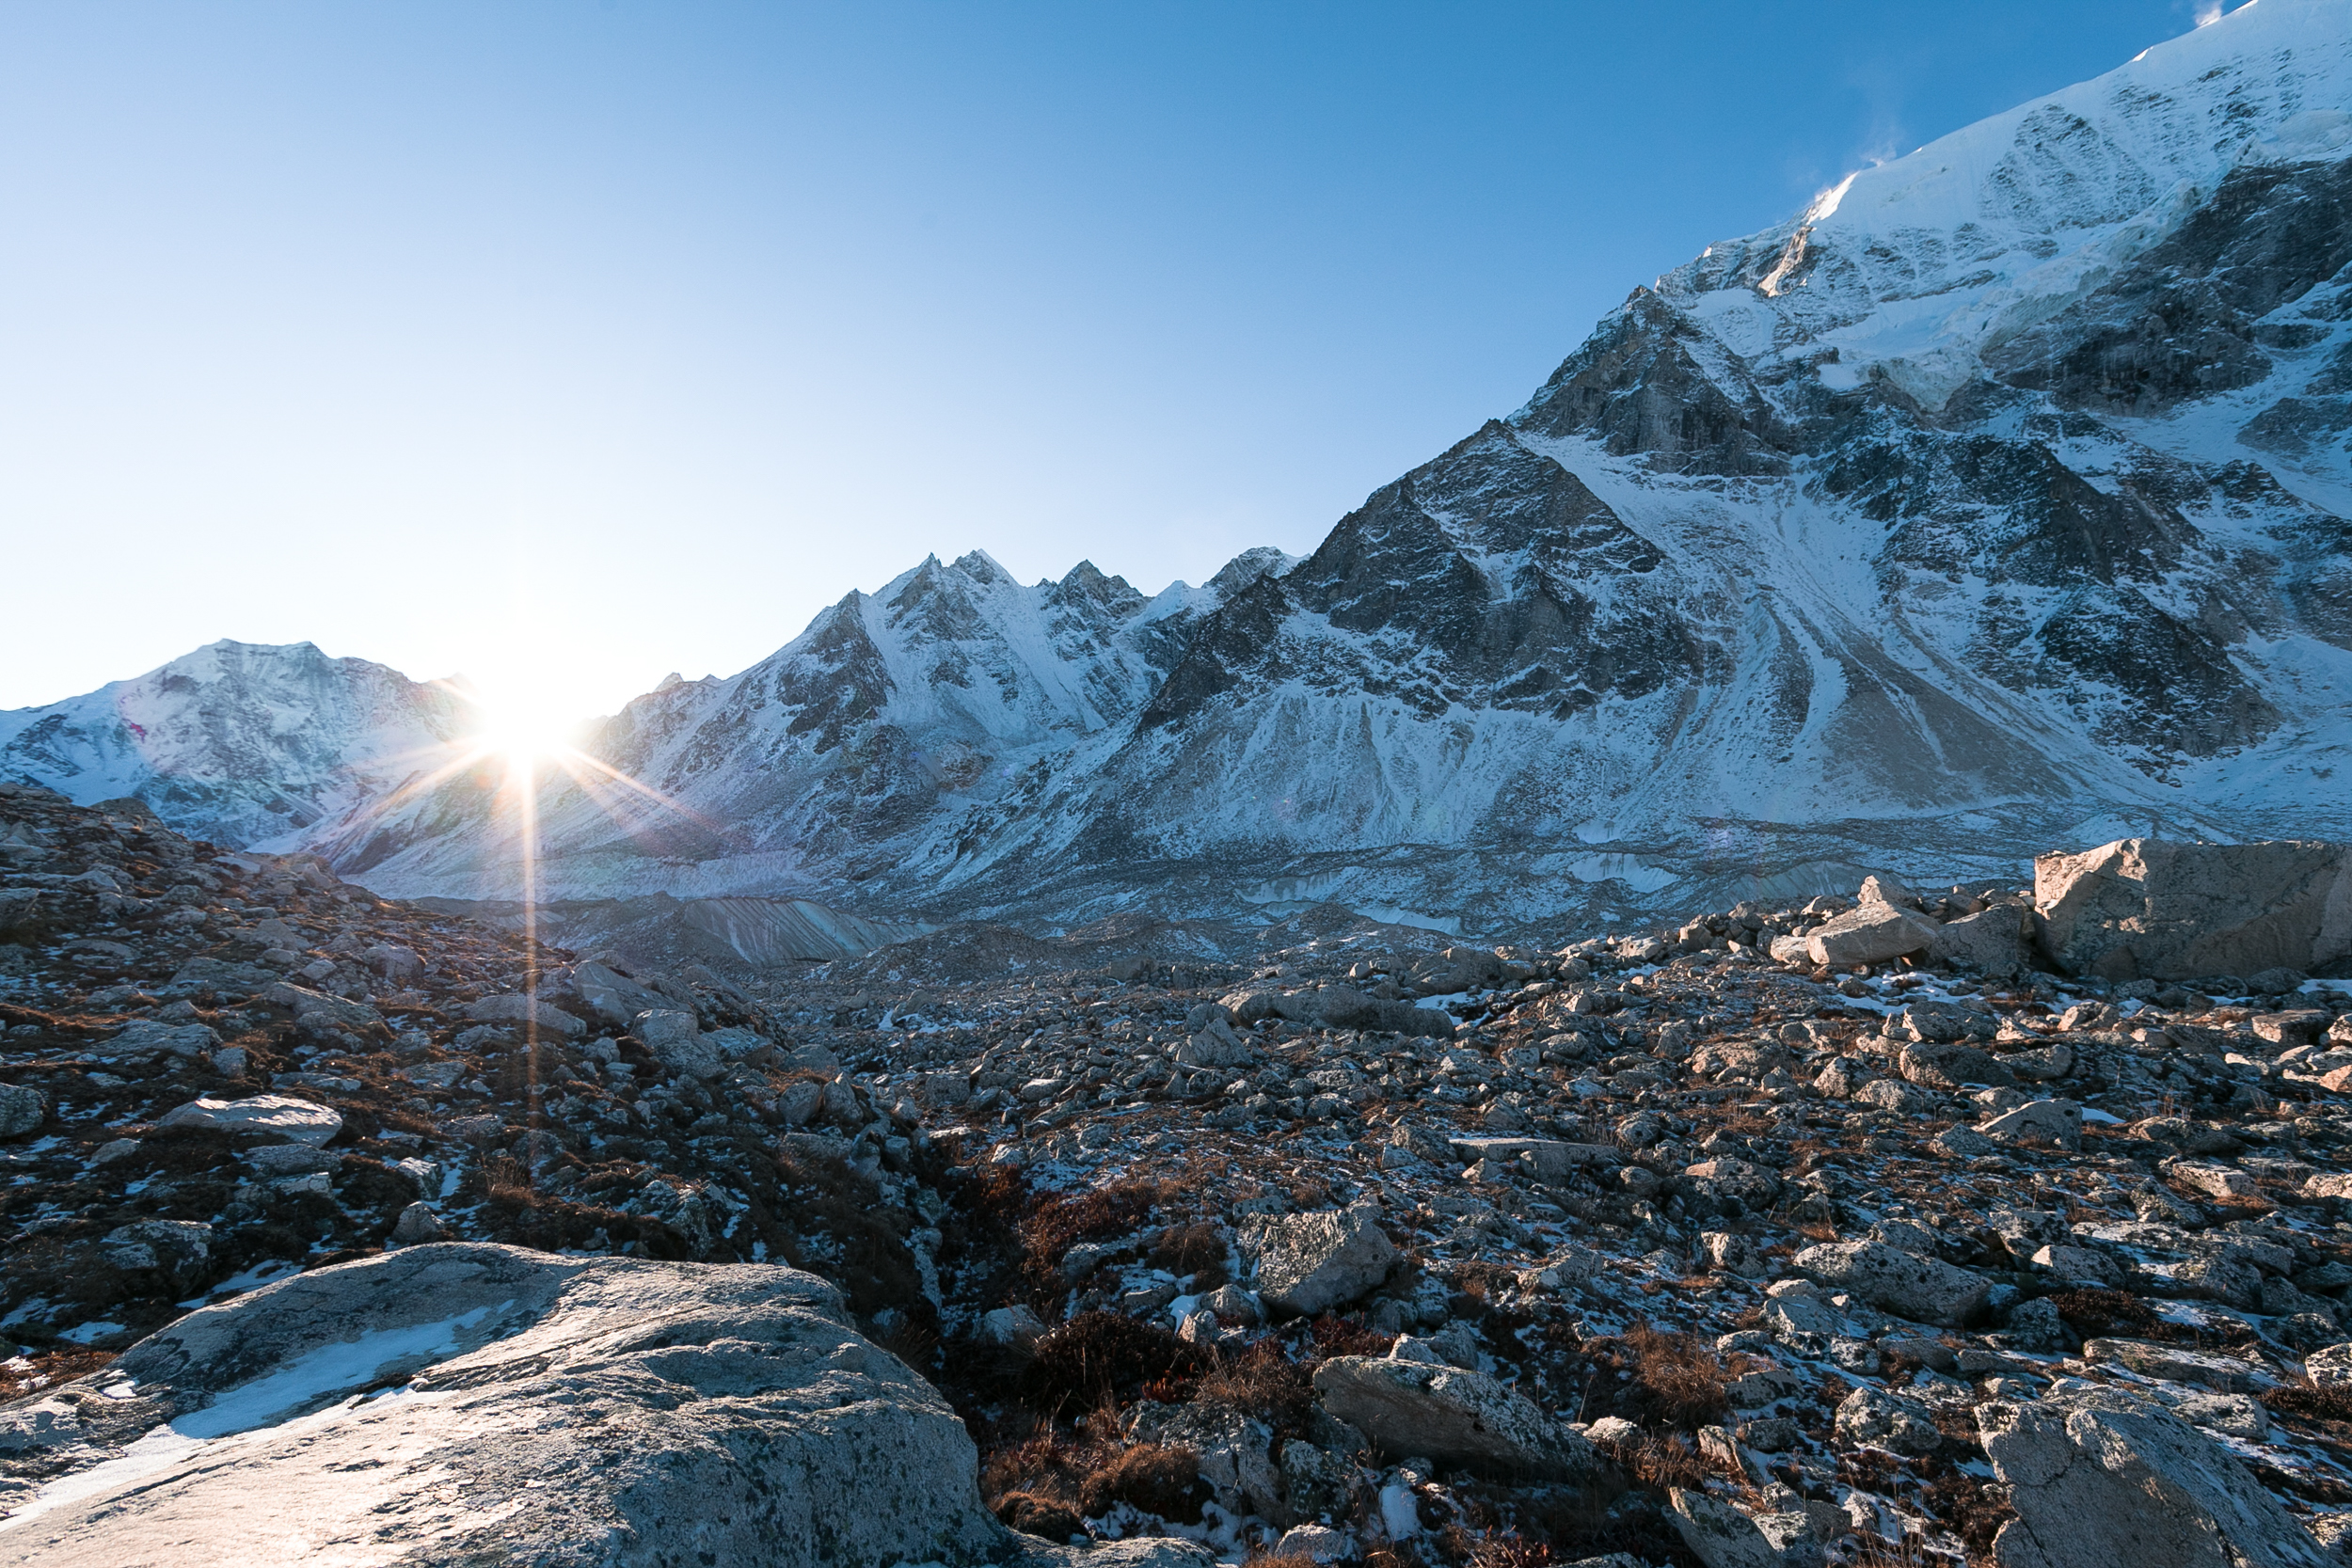 The frozen rocky landscape.